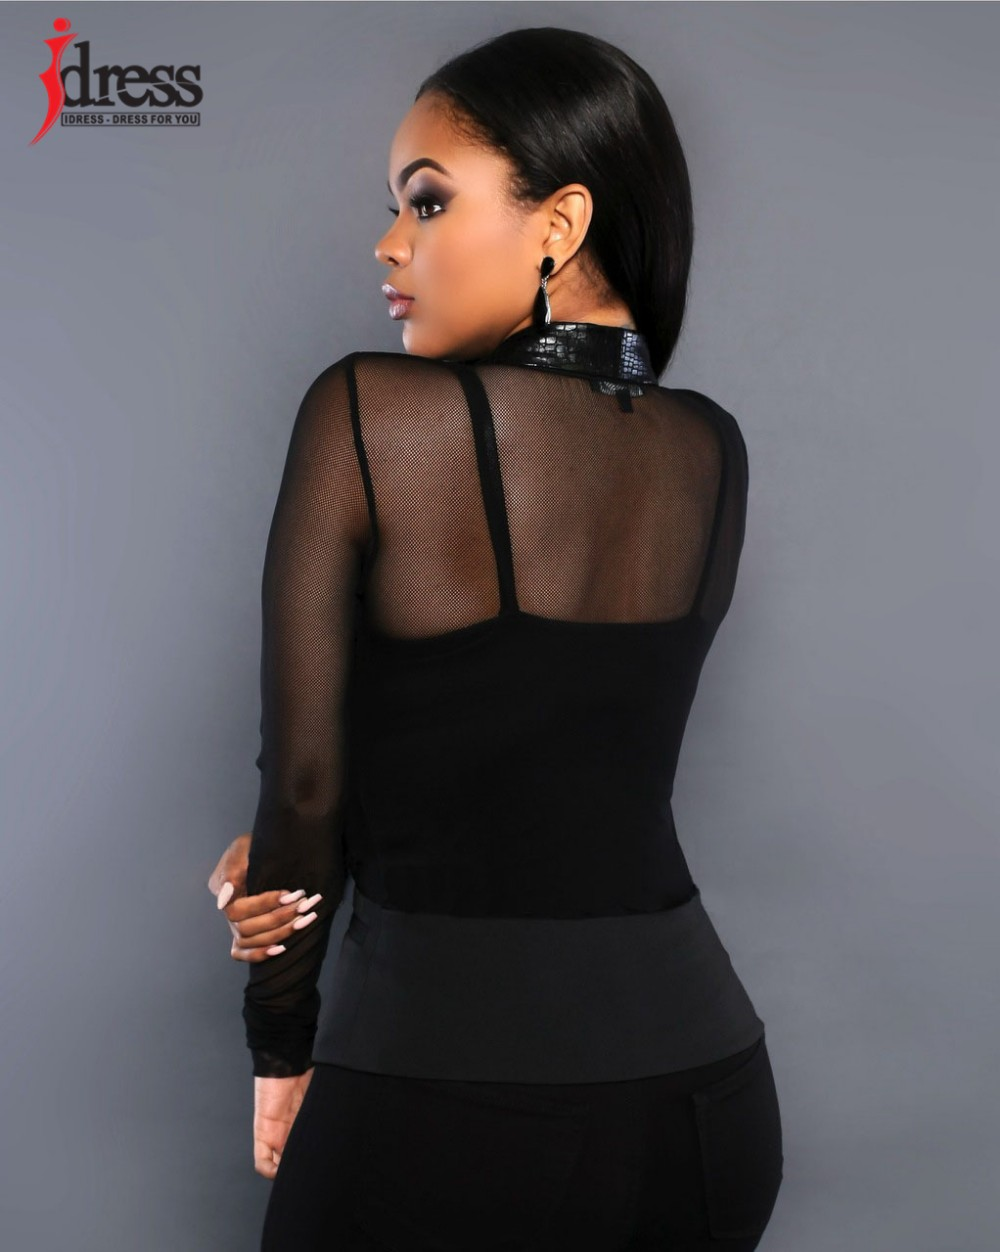 IDress Women Blazer Jackets 2016 Fashion Mulher Sexy Blazer Women Button Veste Femme Blazer Mesh Leather Partchwork Long-Sleeve Slim Blazer Women Blazers (4)